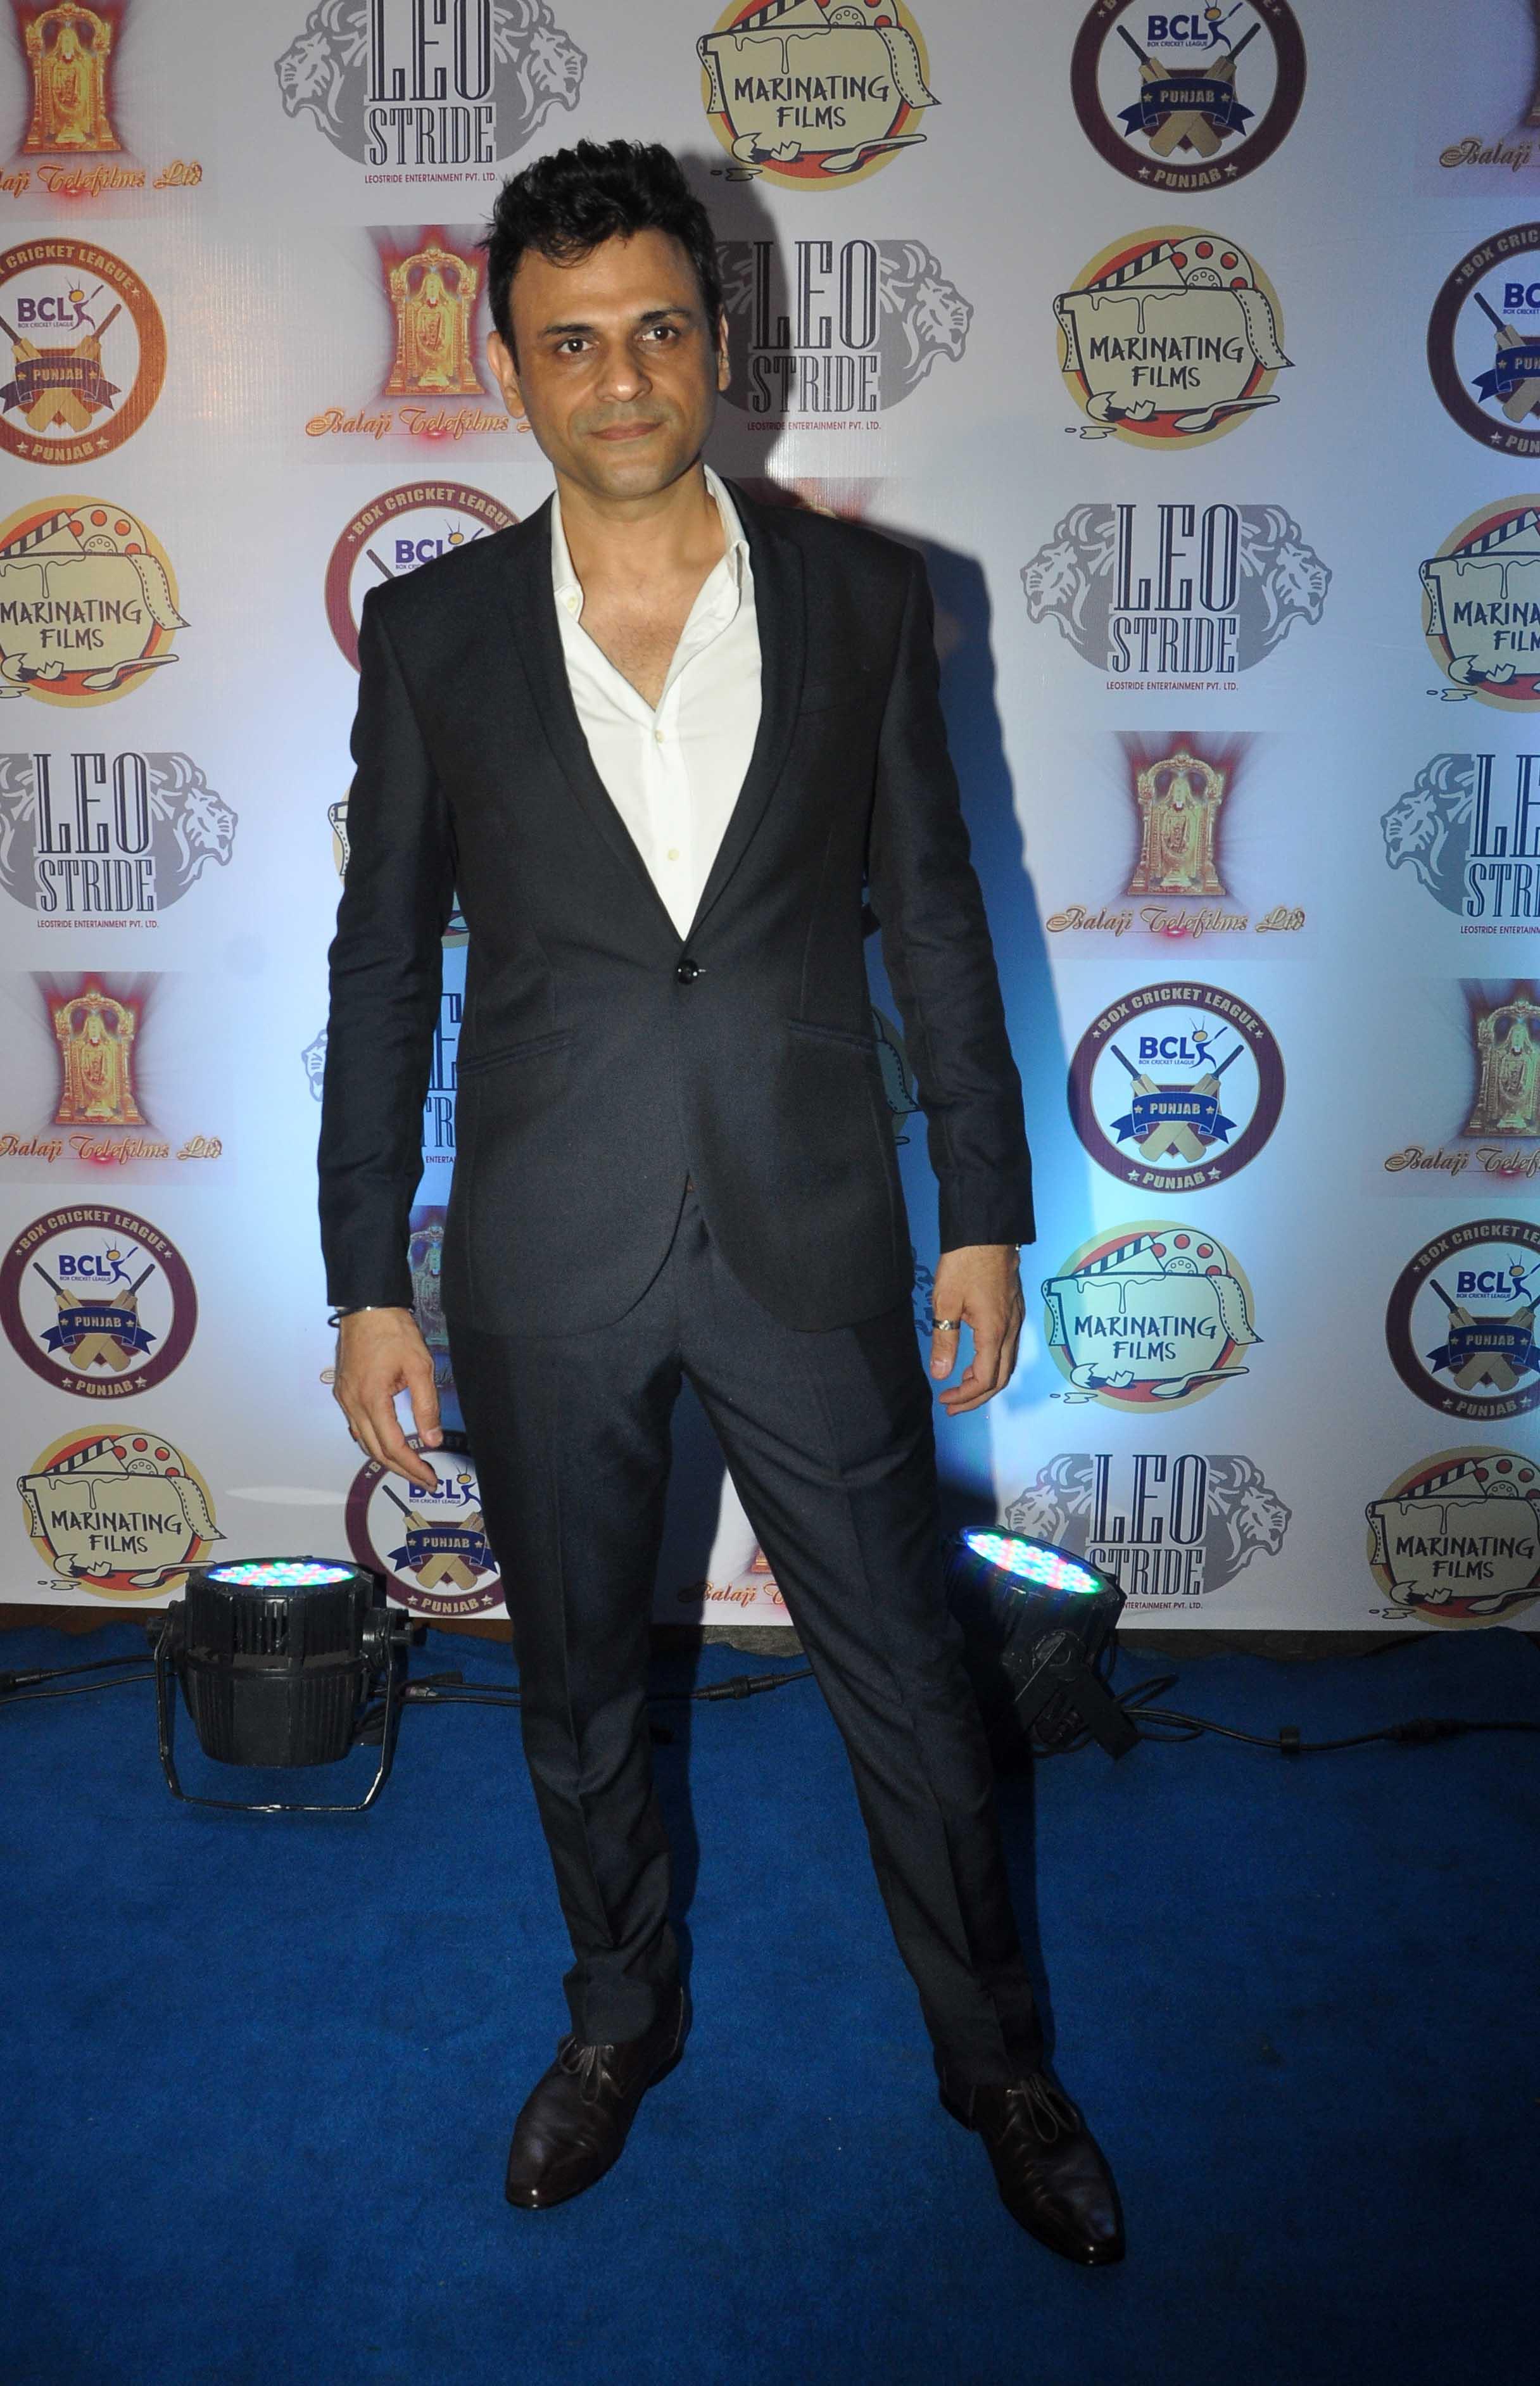 Sumit Dutt at Punjab Cricket Launch